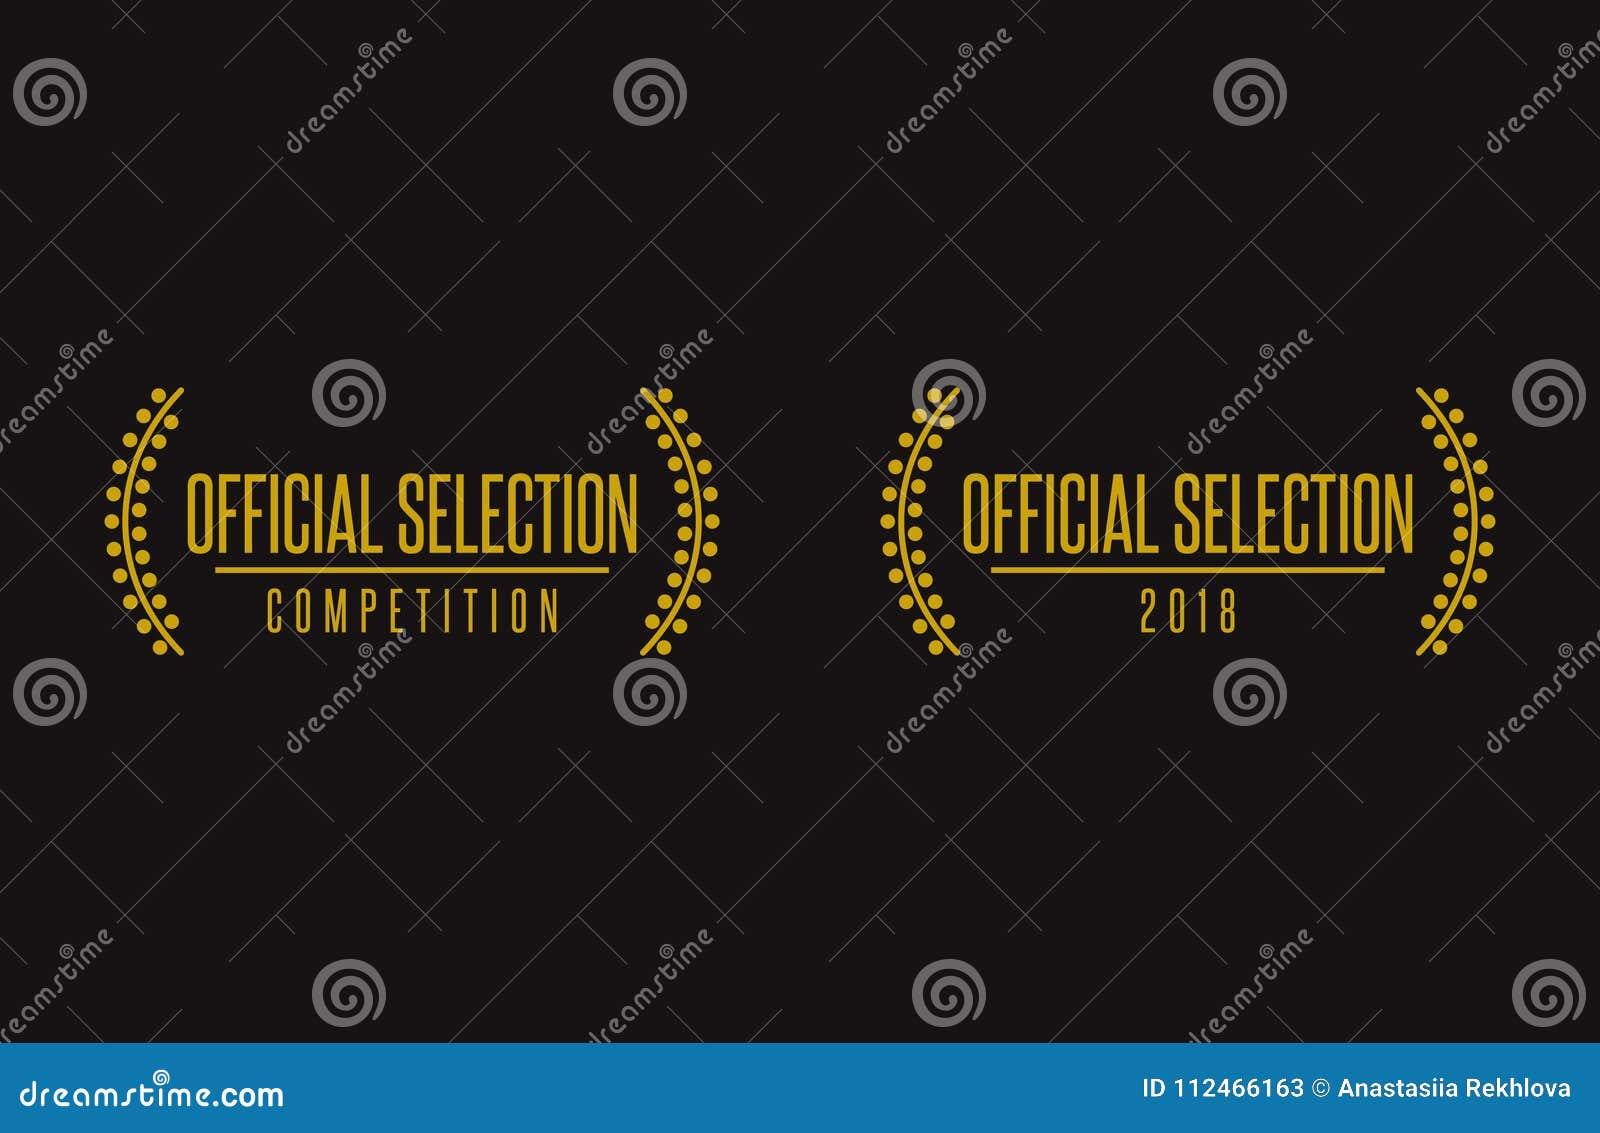 Official Selection Film Festival Logo Stock Vector